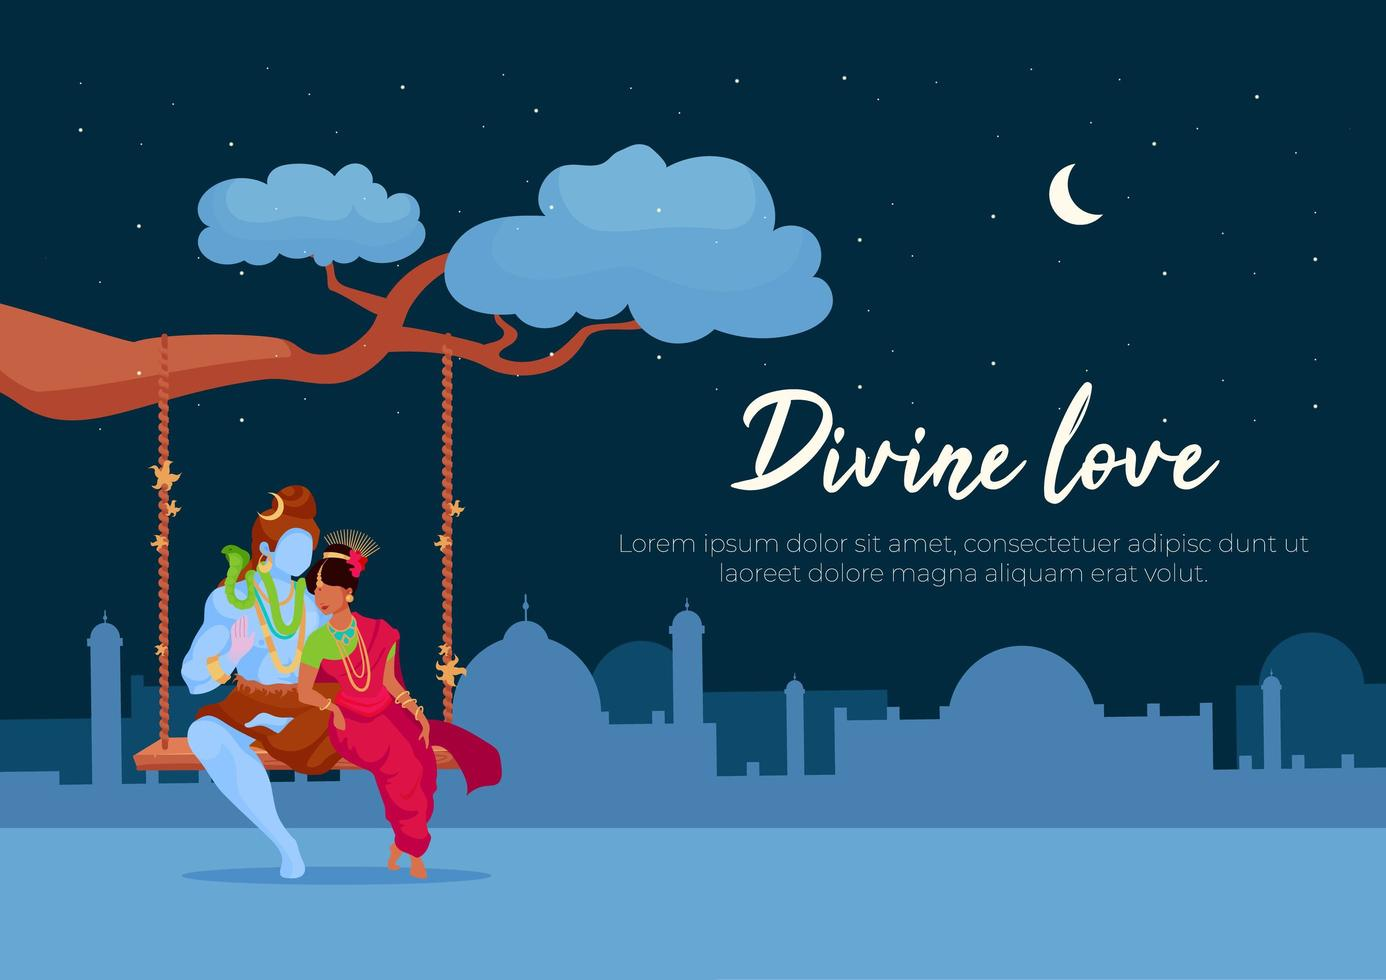 Divine love poster vector